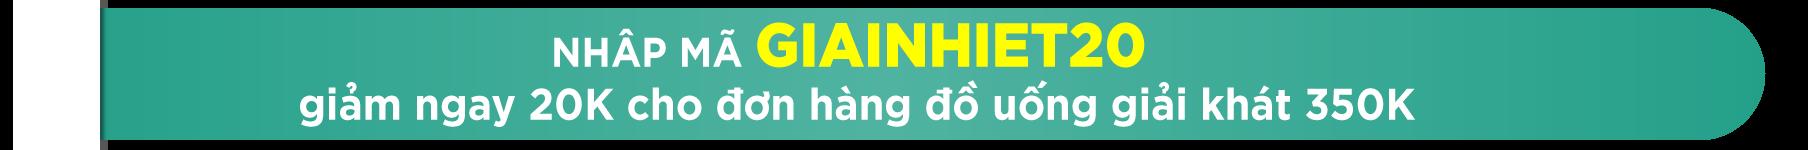 https://tiki.vn/giai-nhiet-mua-he-bho/c32154?_lc=Vk4wMzkwMDcwMTI%3D